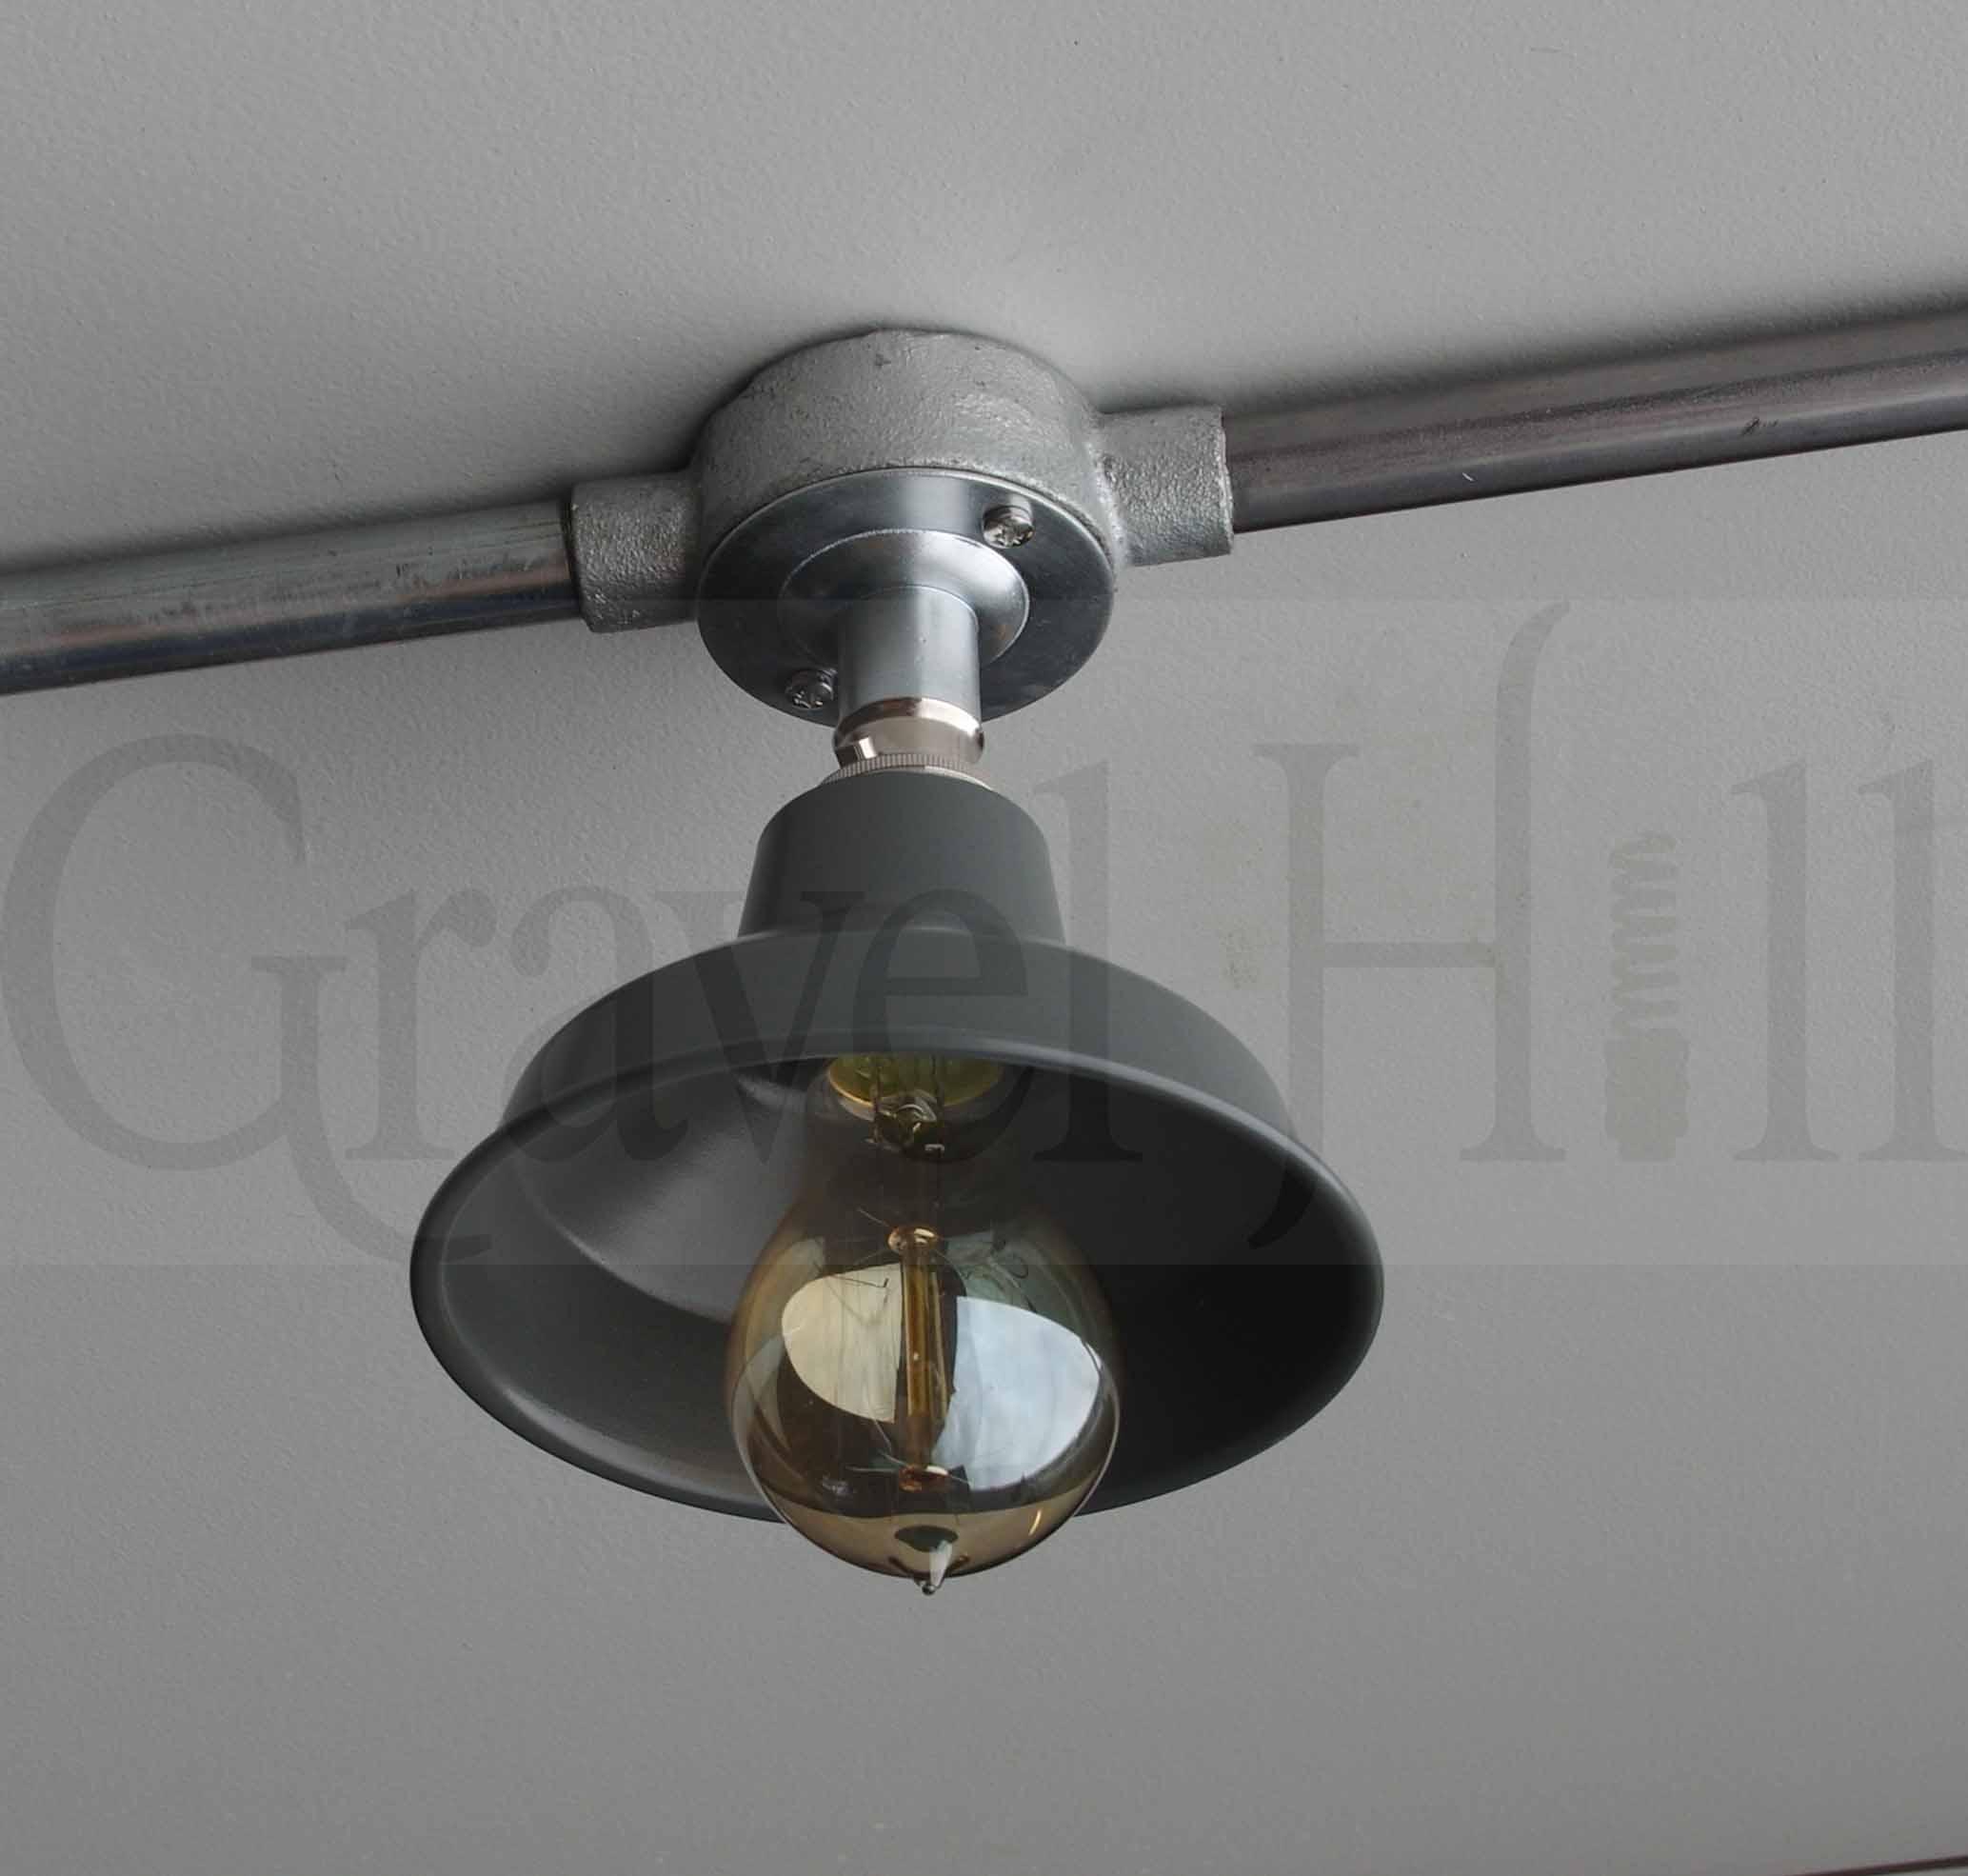 Conduit Savannah Ceiling Ing Gh Grey